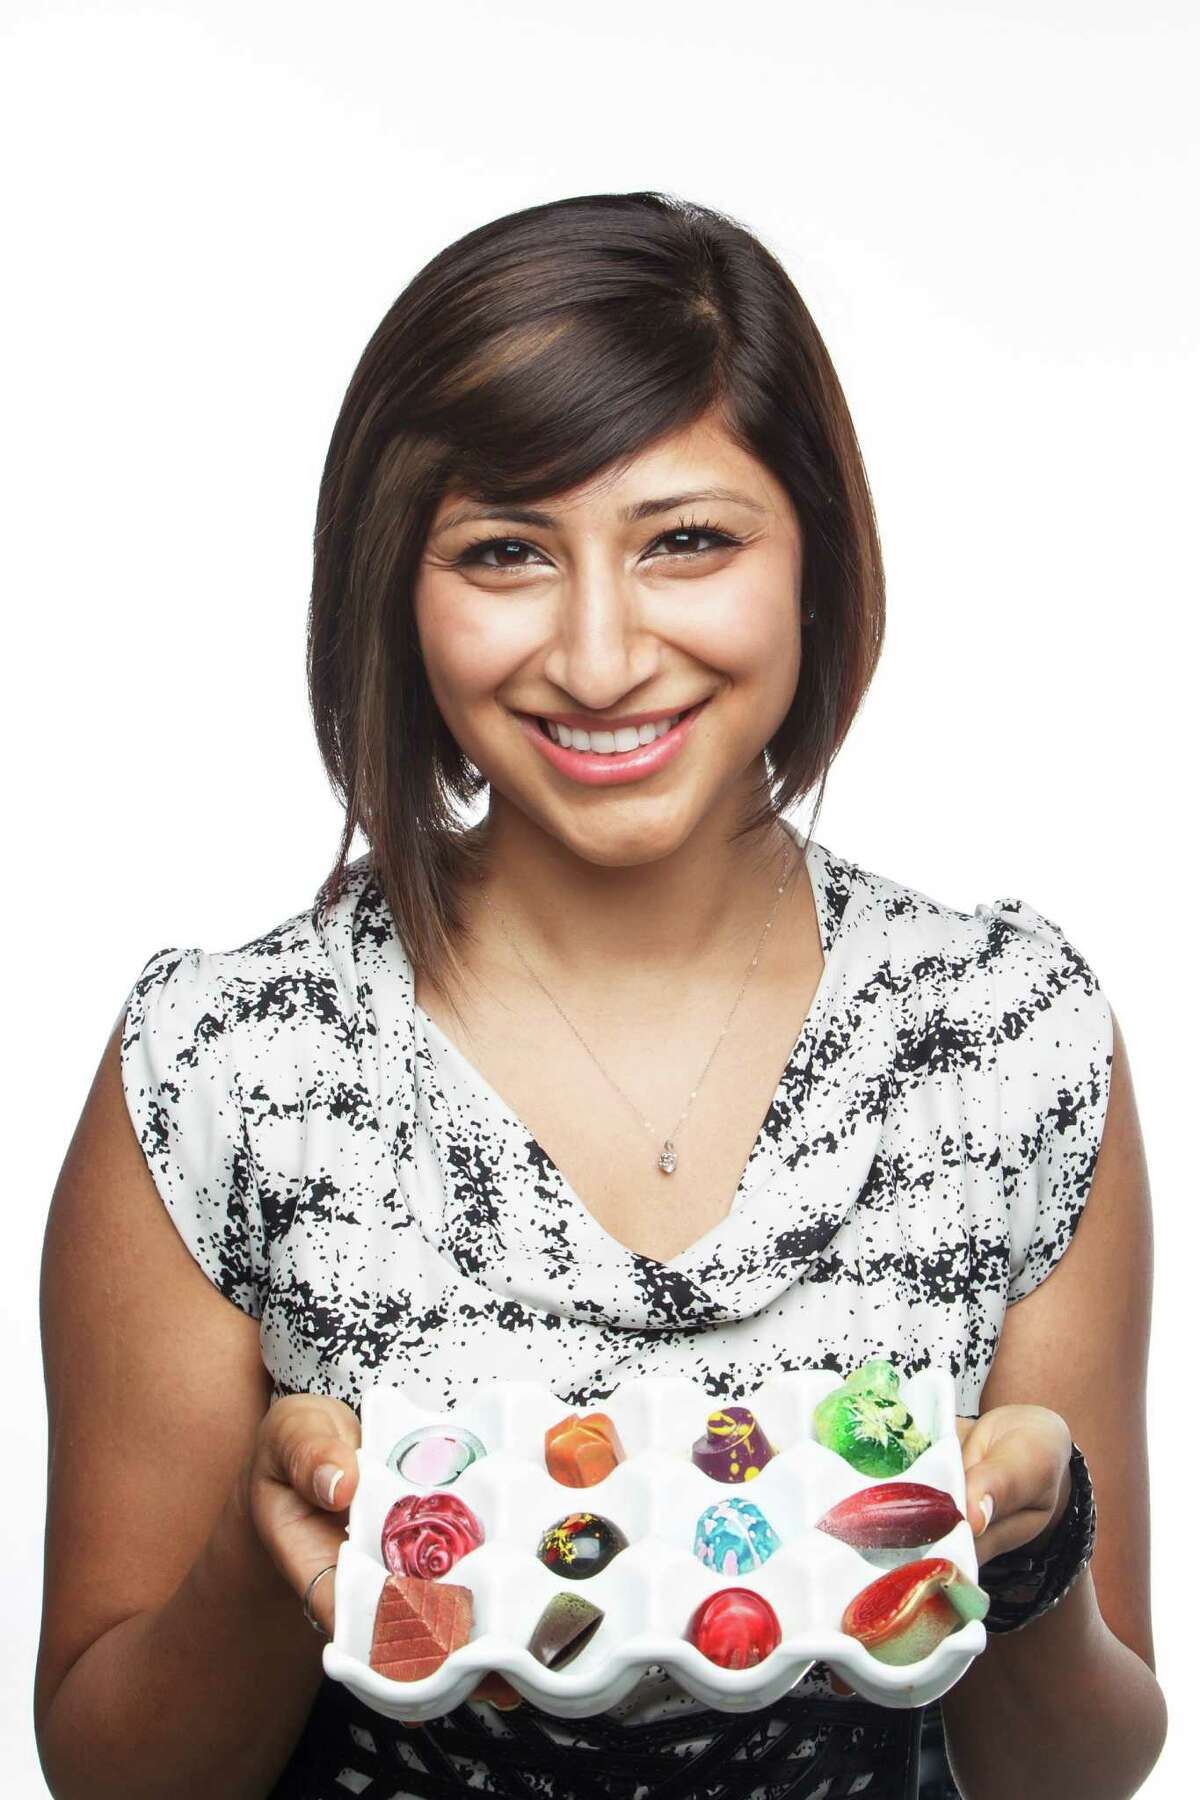 Annie Rupani, owner of Cacao & Cardamom chocolate company